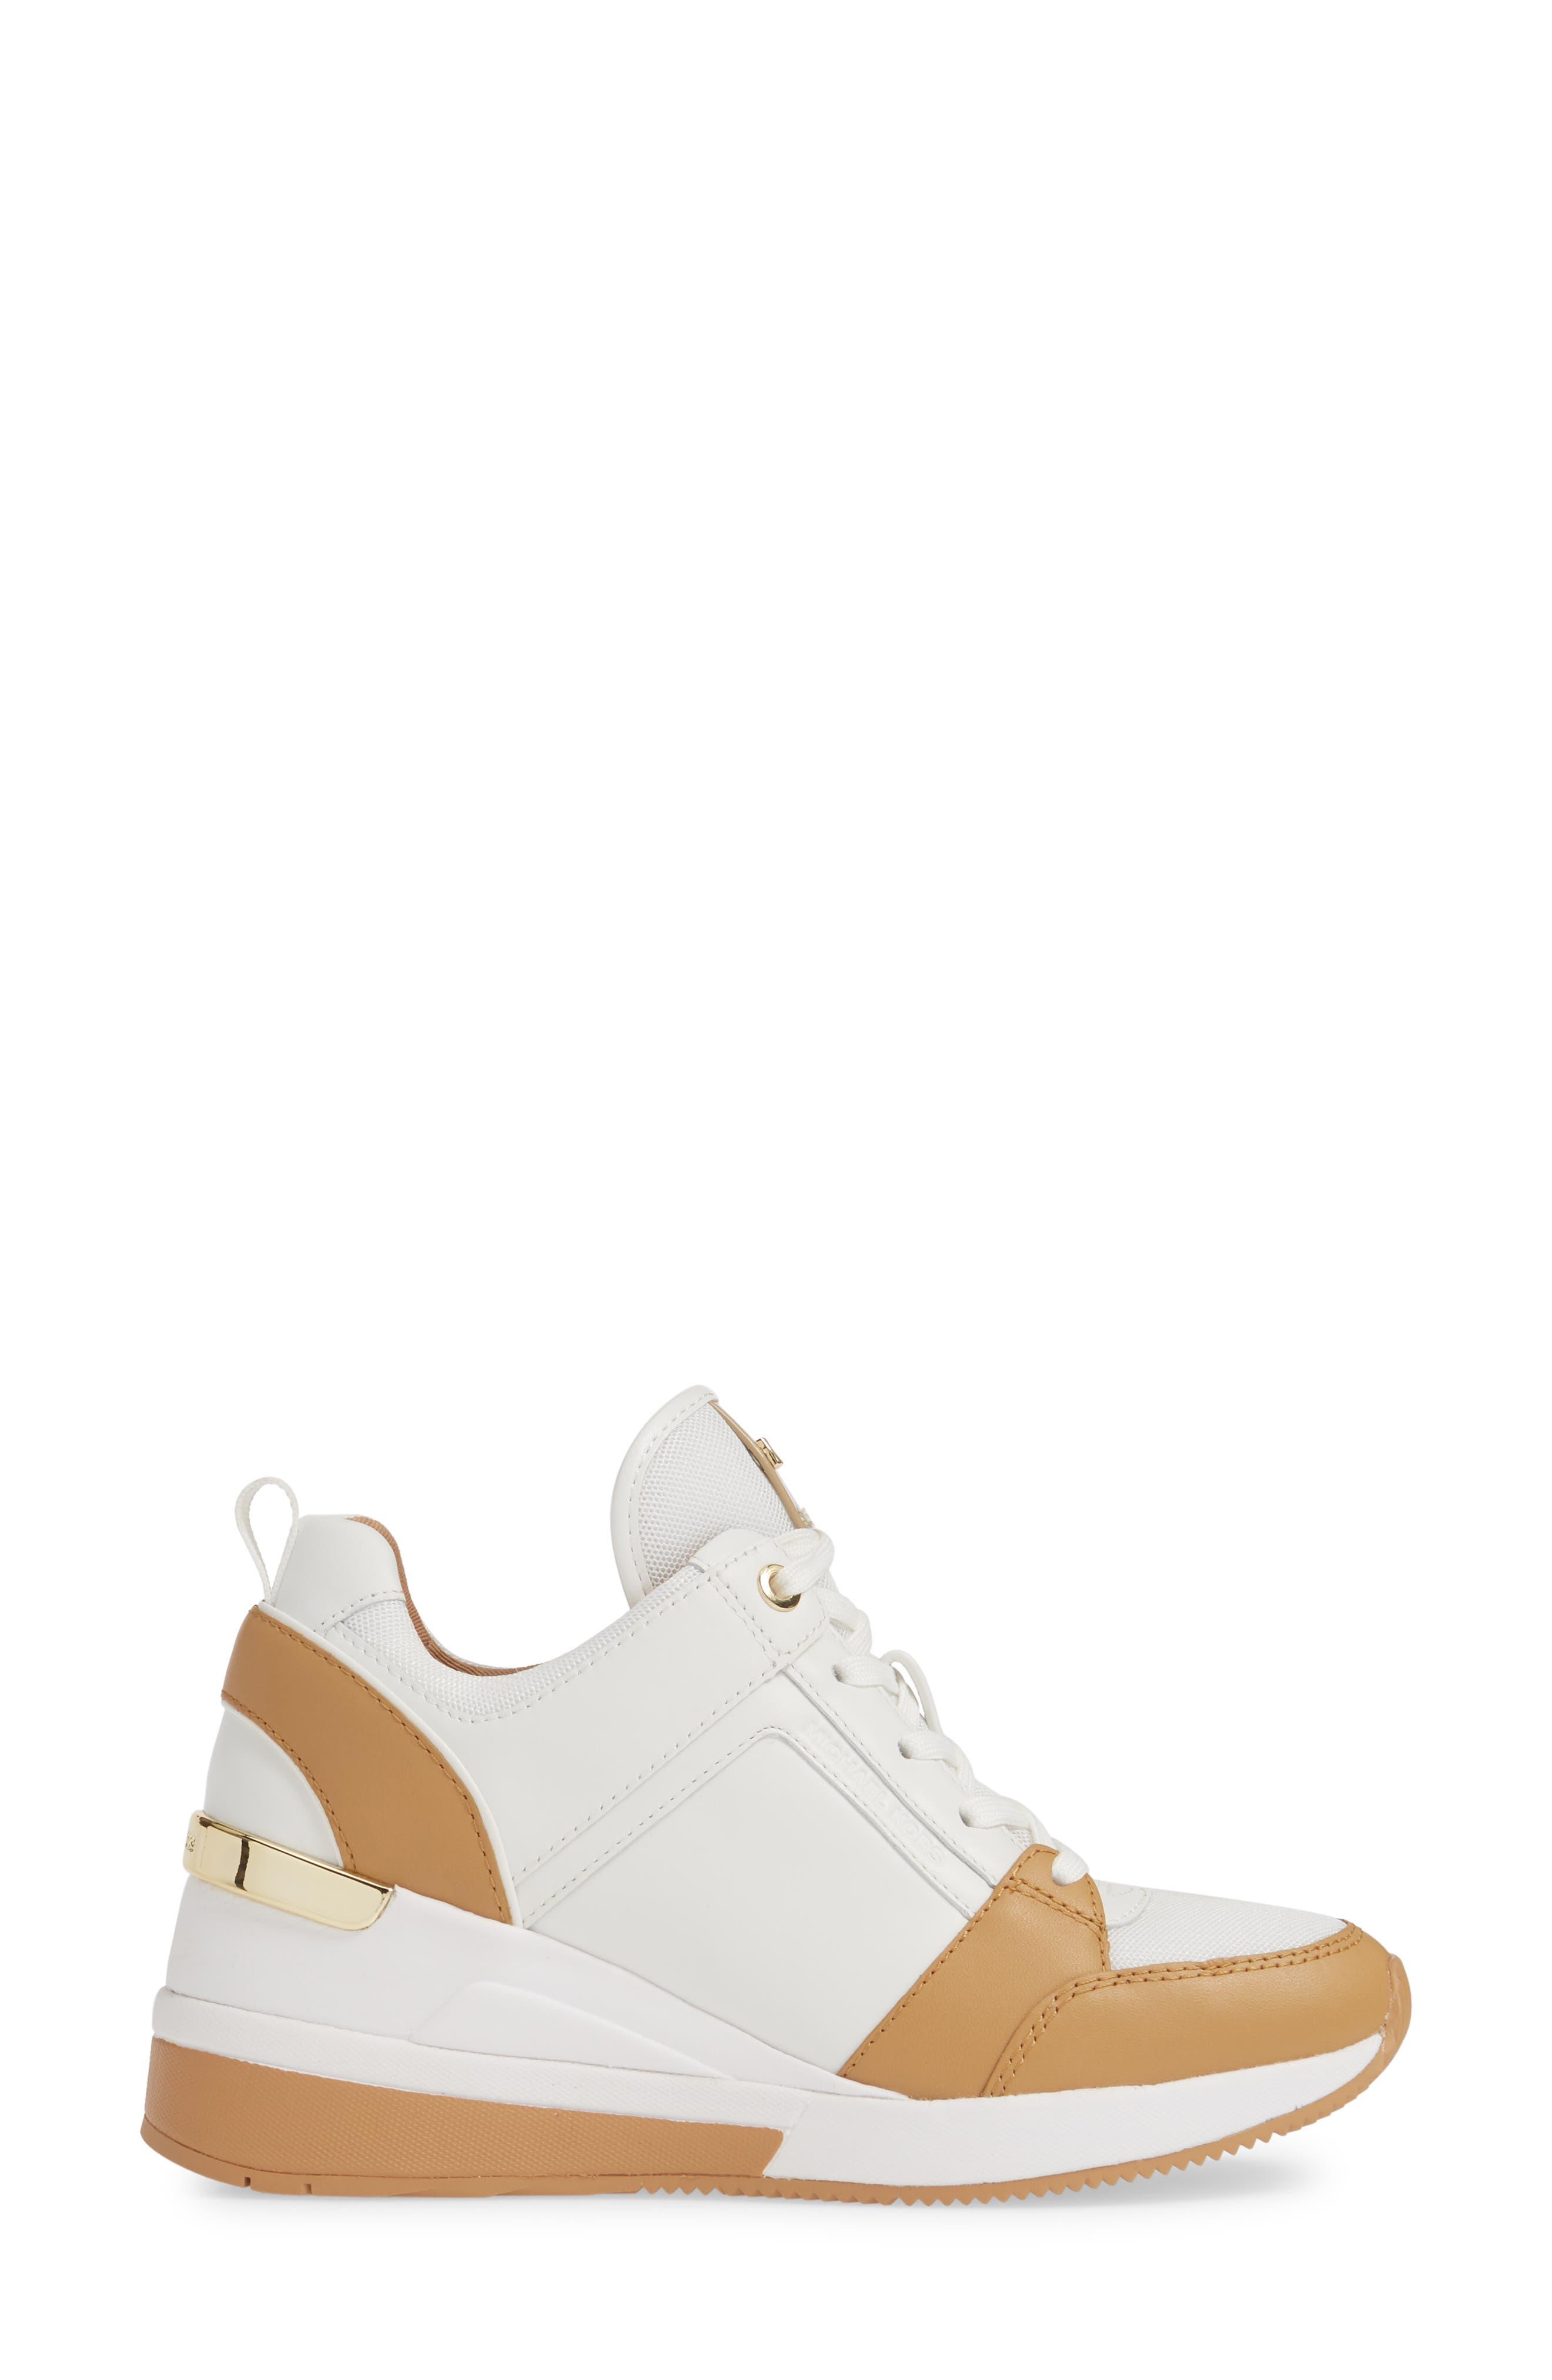 MICHAEL MICHAEL KORS,                             Georgie Wedge Sneaker,                             Alternate thumbnail 3, color,                             OPTIC WHITE MULTI